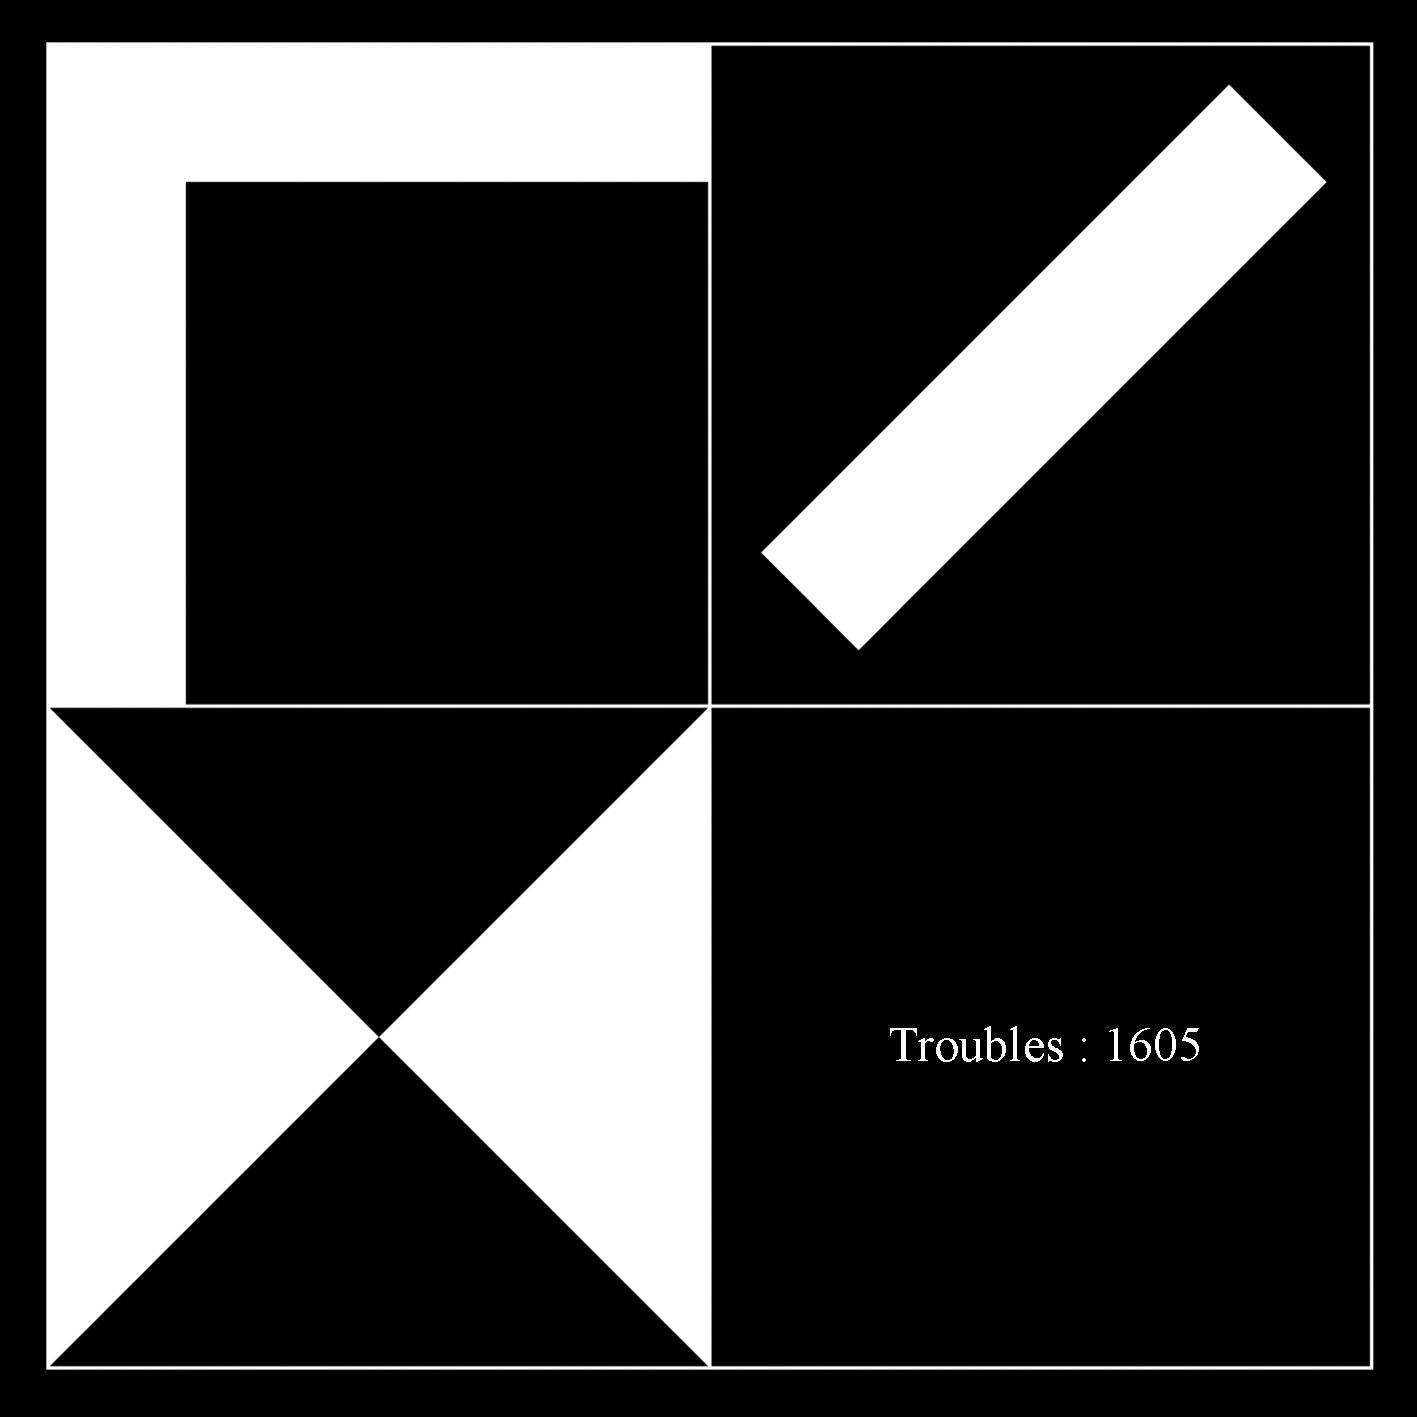 1605 - Single